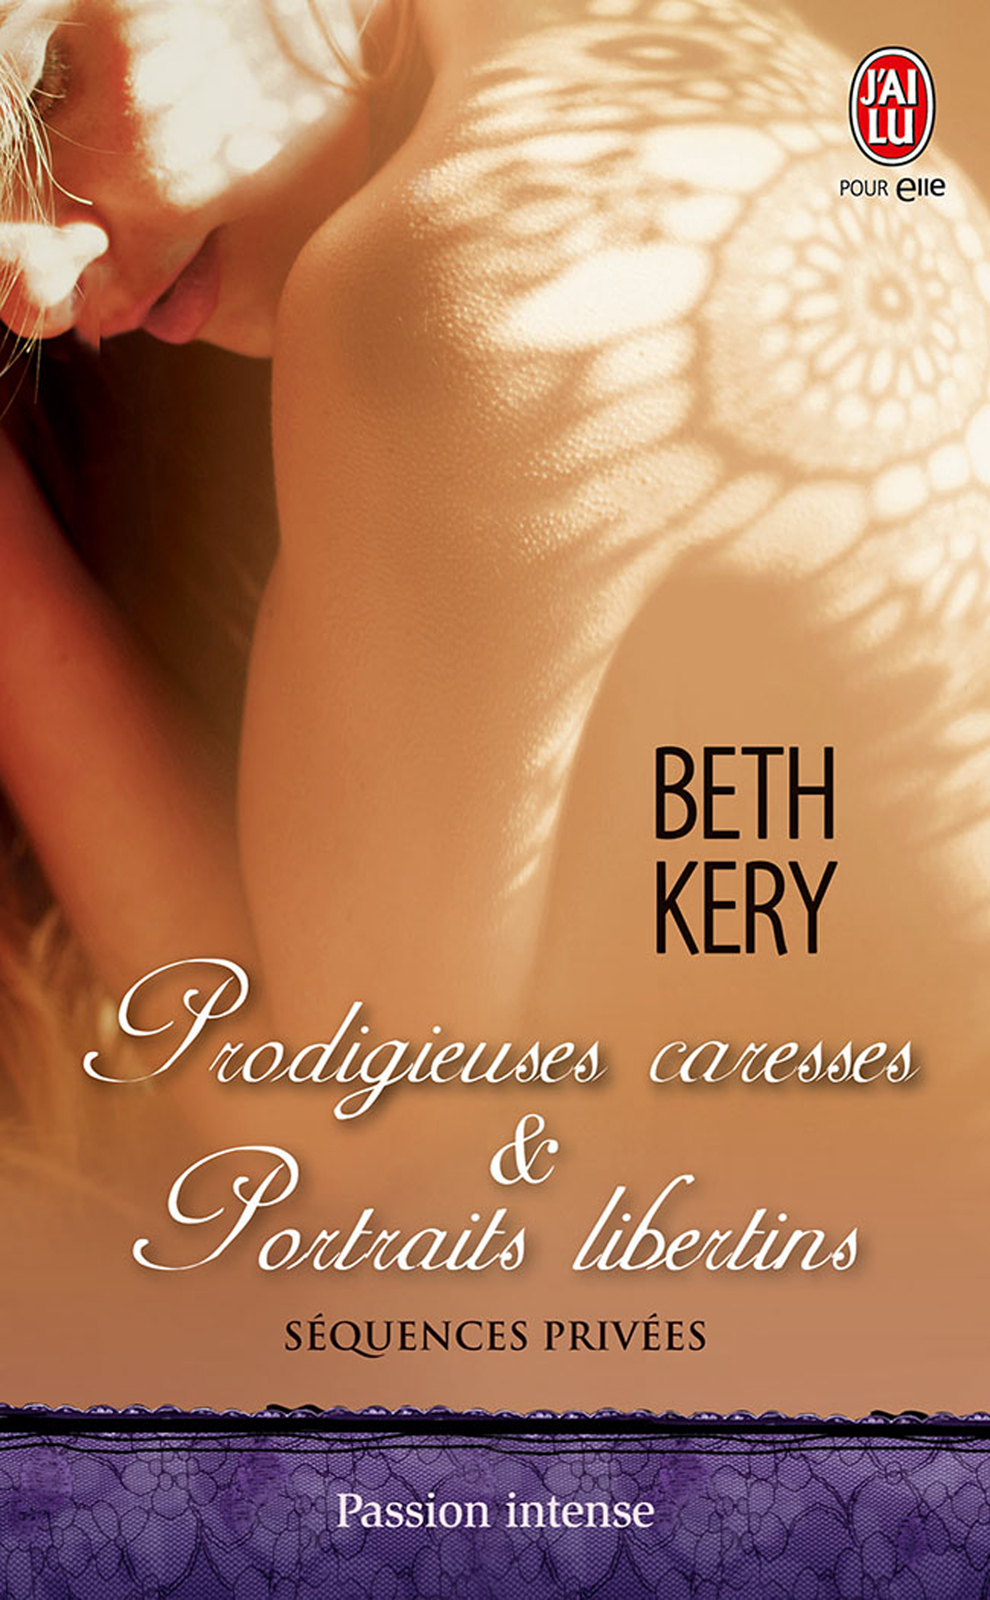 Séquences privées. Prodigieuses caresses & portraits libertins